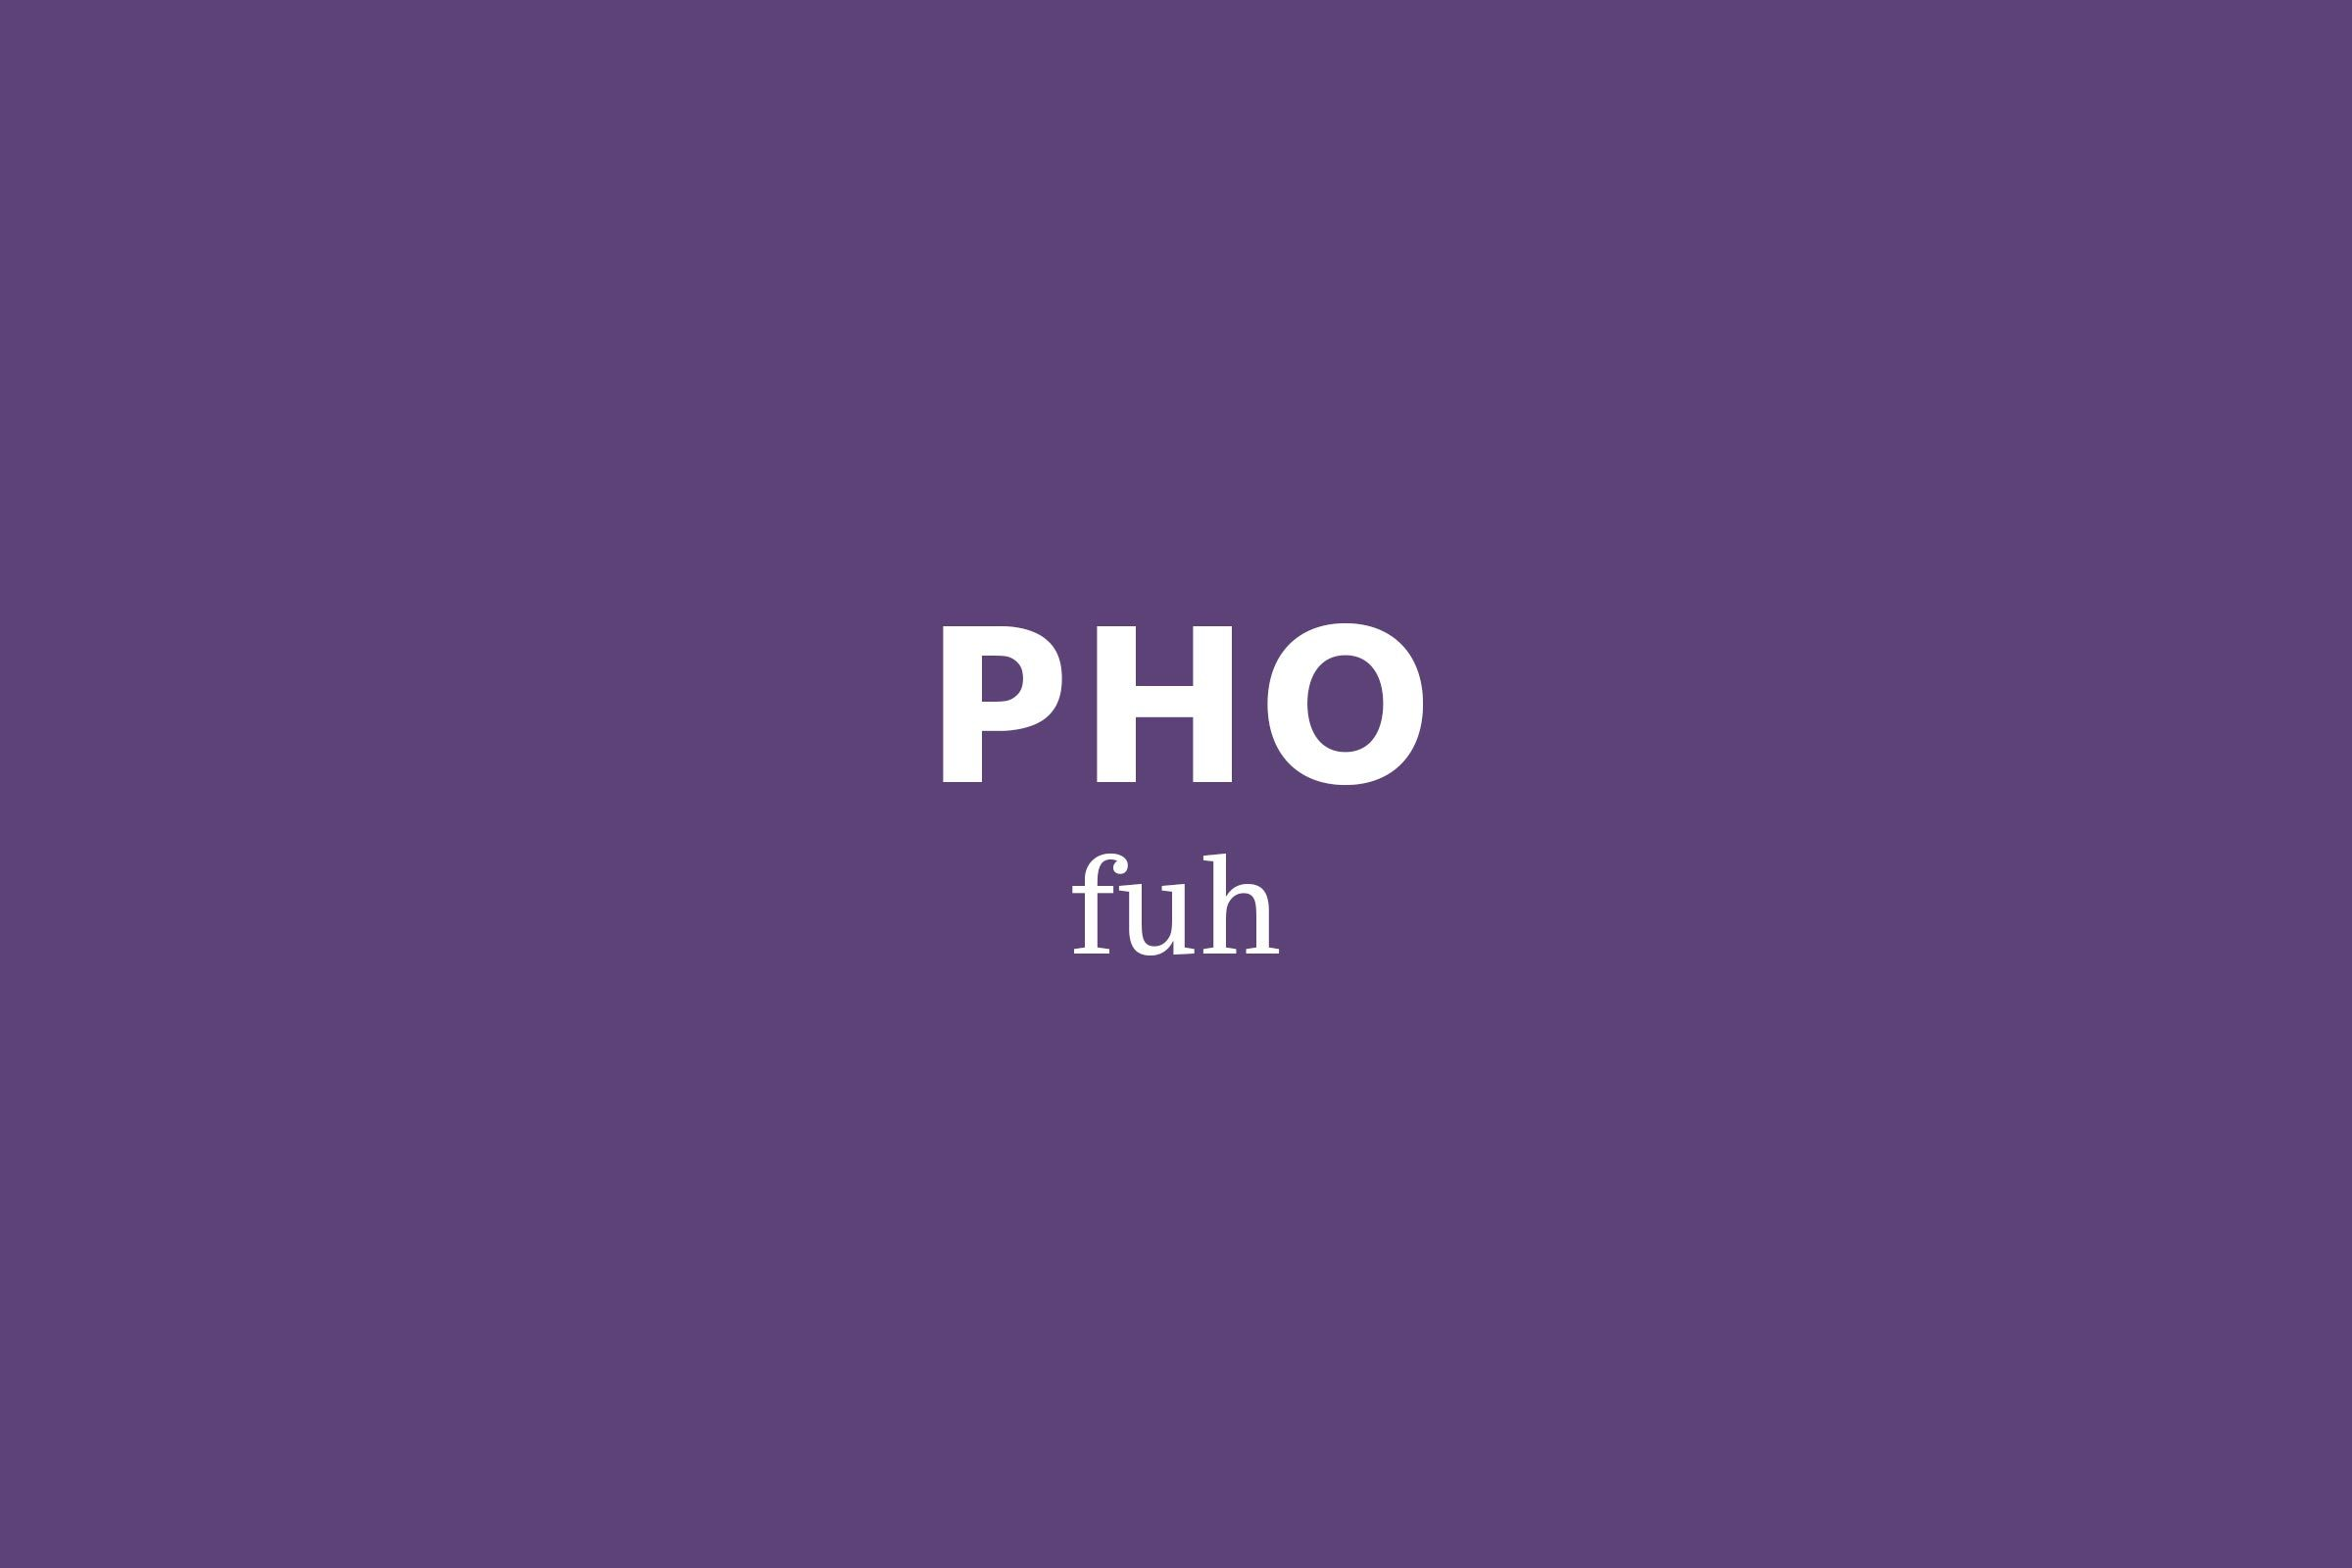 pho pronunciation